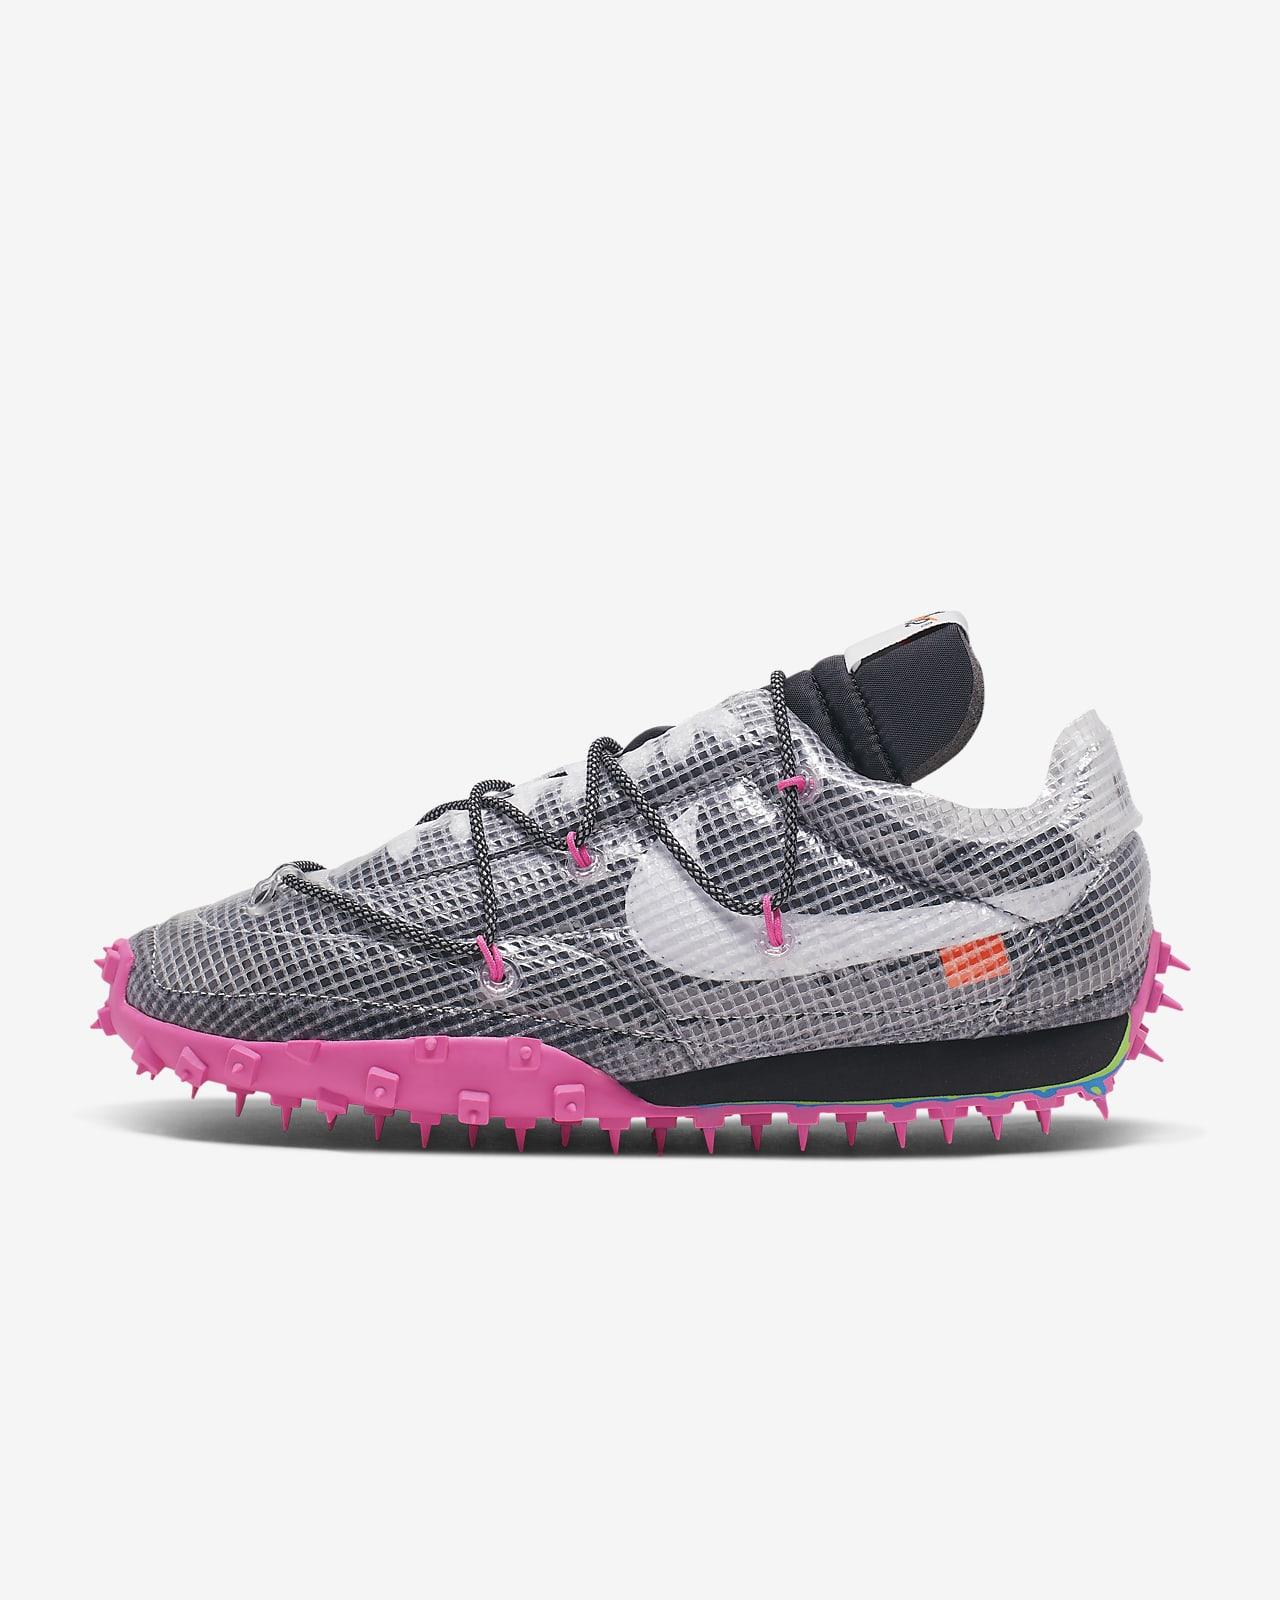 Nike Waffle Racer/OW 女子运动鞋